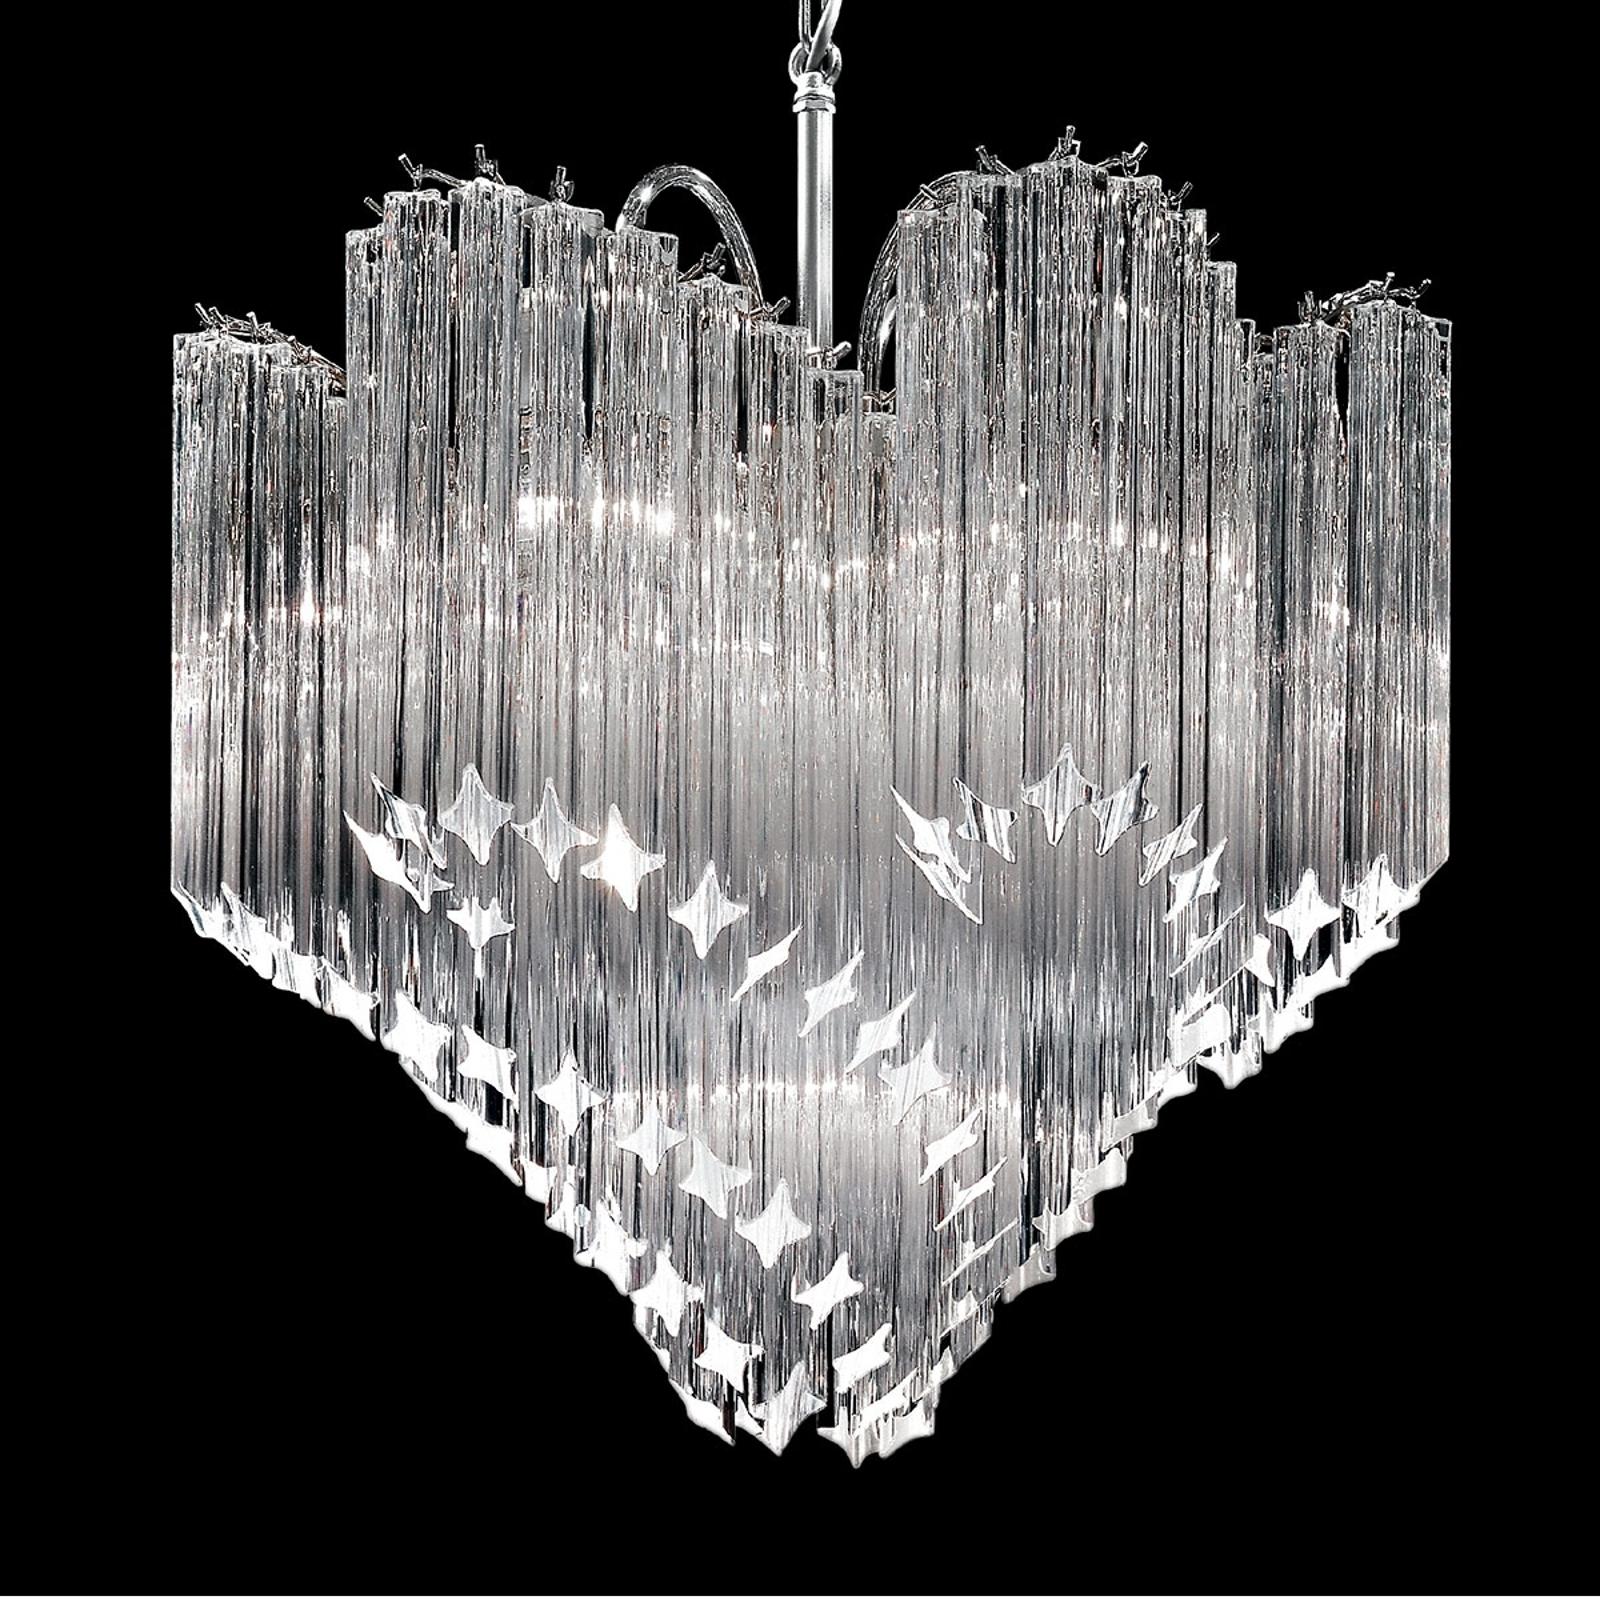 Kristallen hanglamp Chiocciola